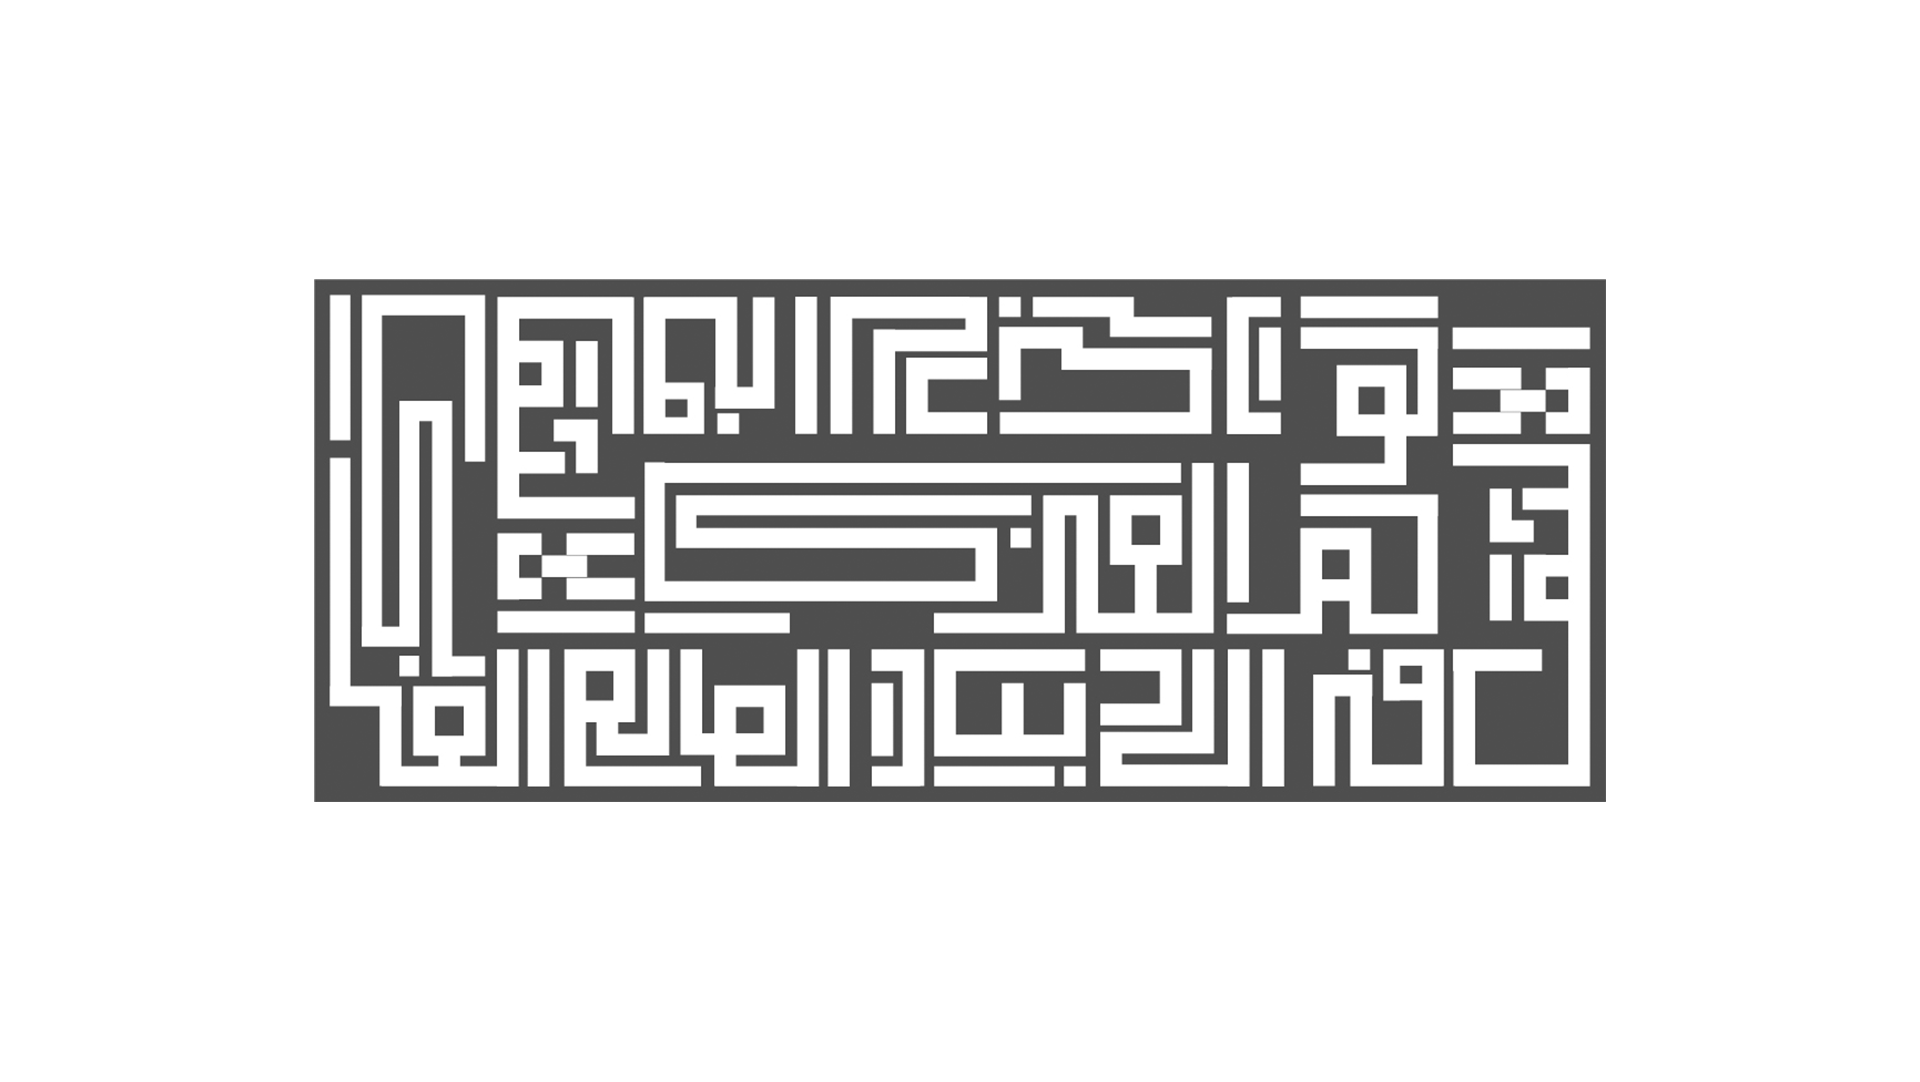 Studio Kat Rahmani Calligraphy Doha Cultural Museum 2011 خوشنویسی موزه فرهنگی دوحه